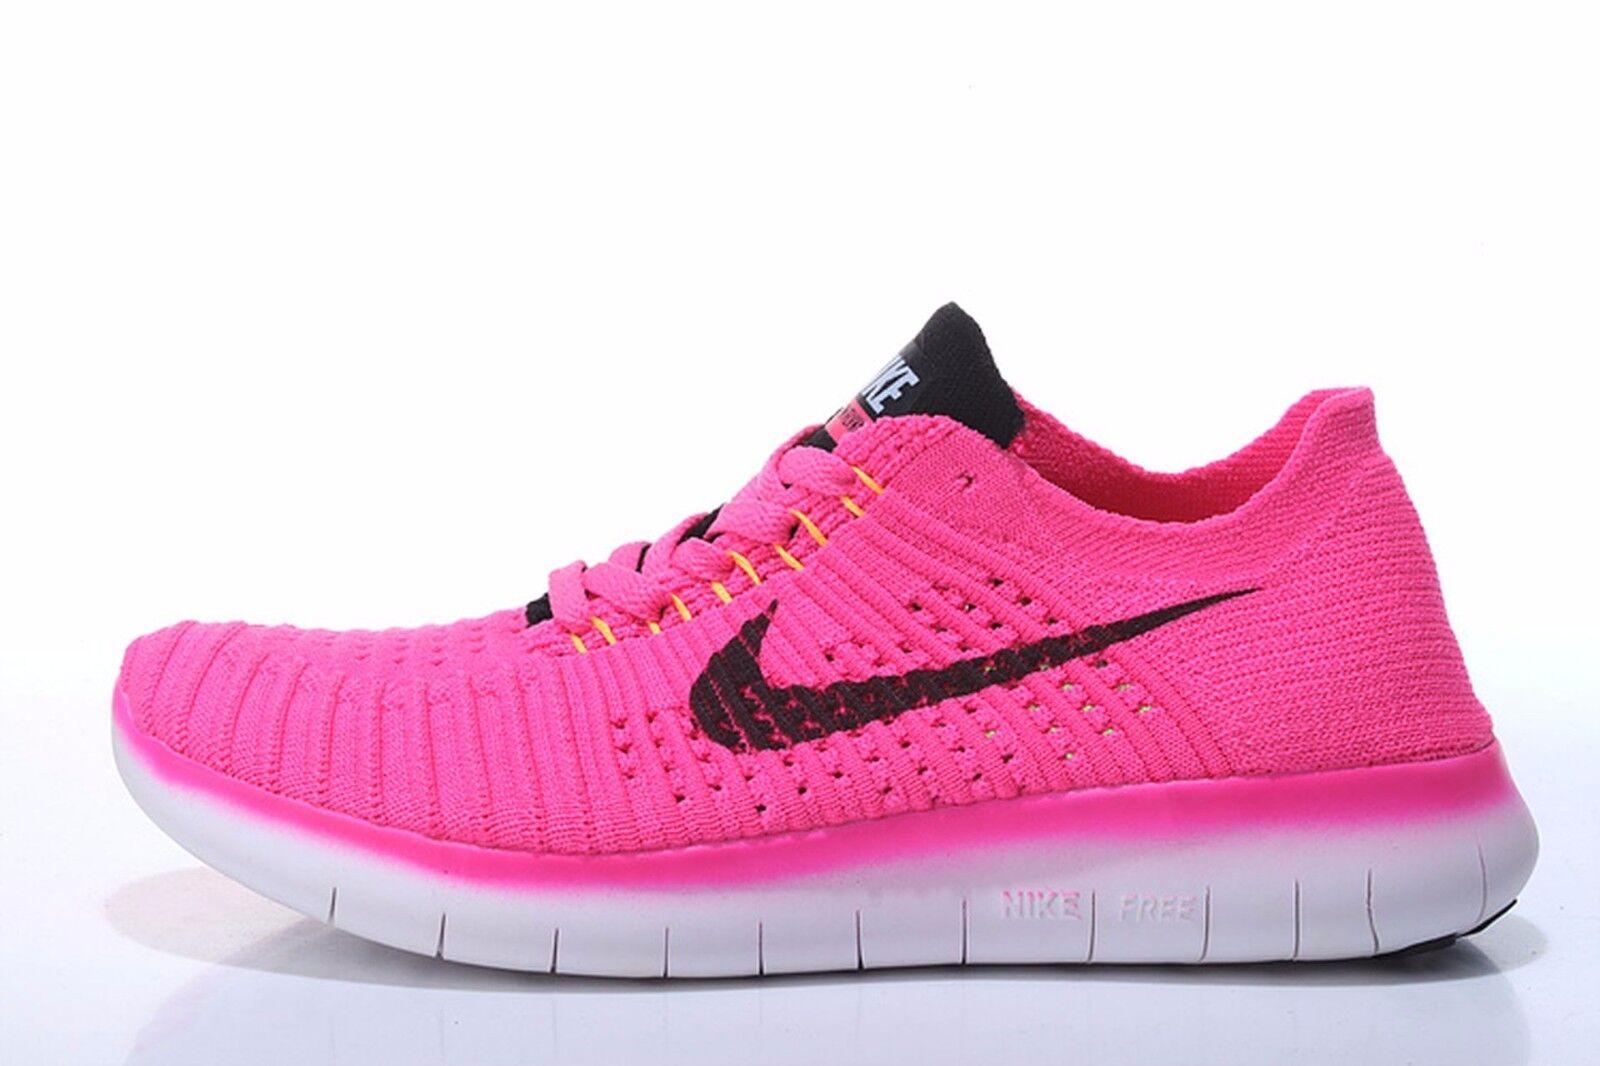 Nike Free RN Flyknit 831070 600 Wmn Sz 7 Pink Blast Black-Laser orange-Hyper Pun